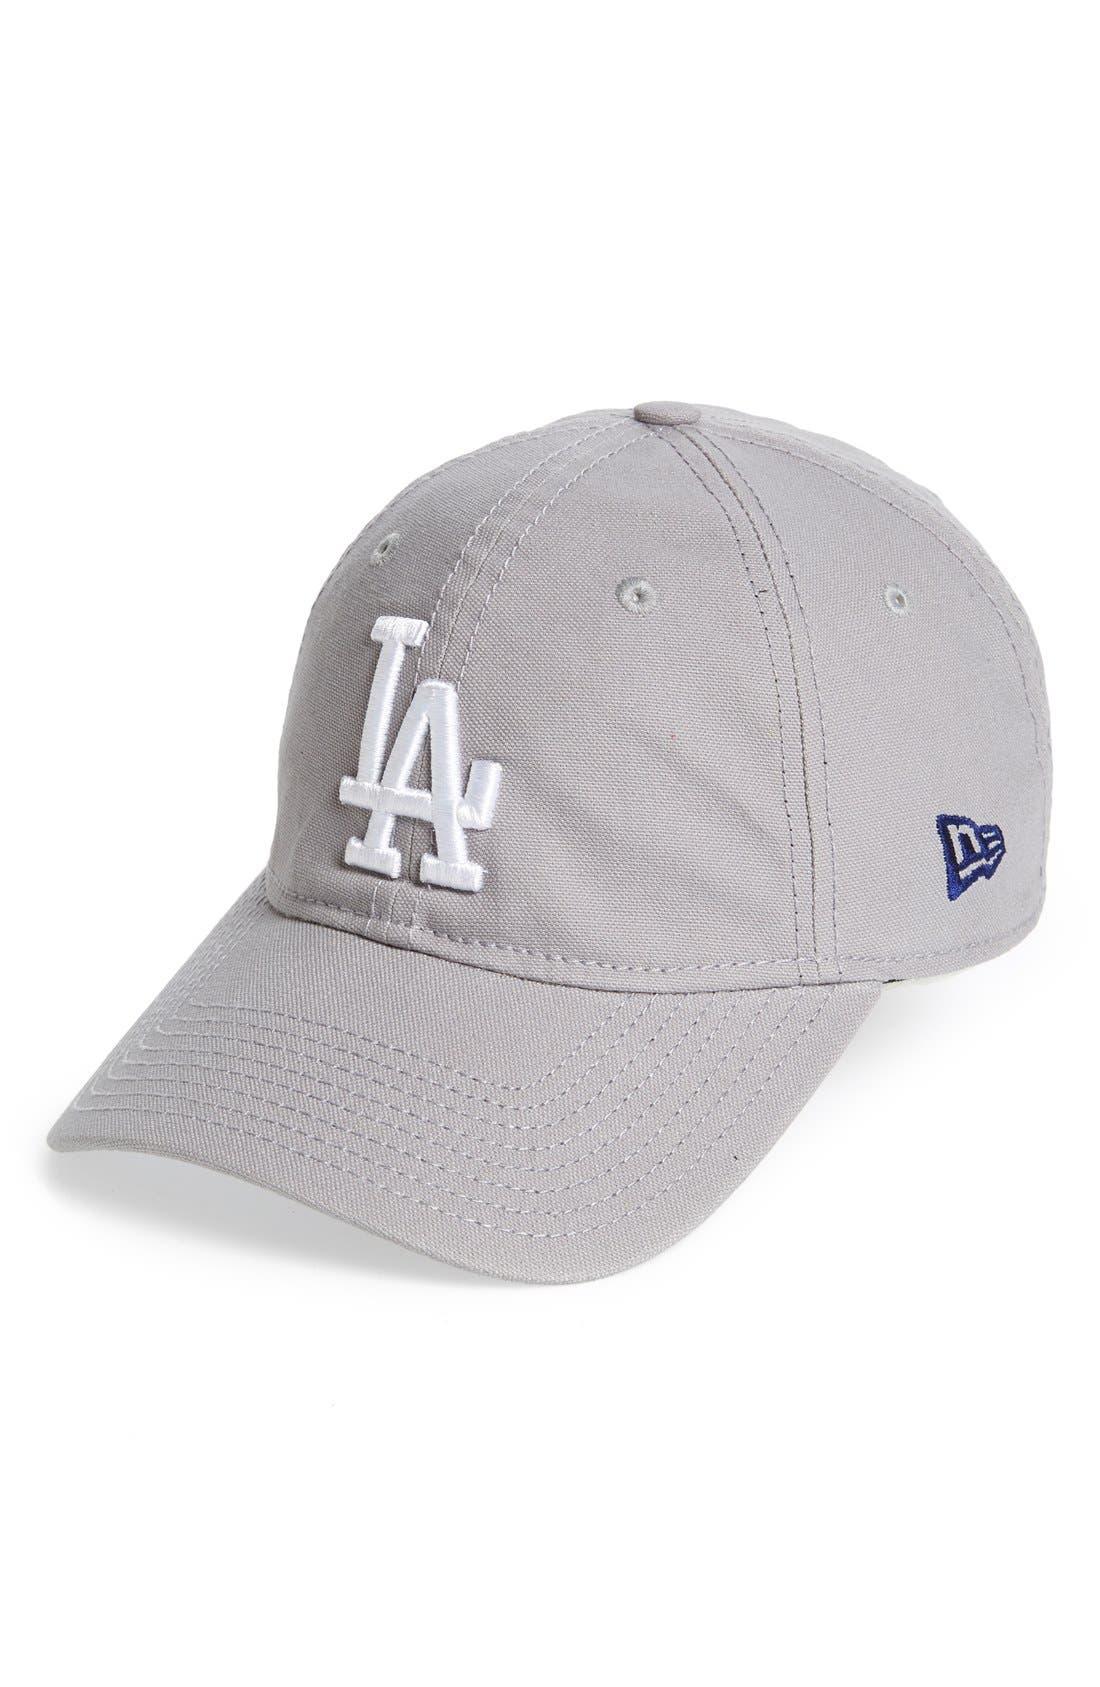 Main Image - New Era Cap 'Core Shore - Los Angeles Dodgers' Baseball Cap